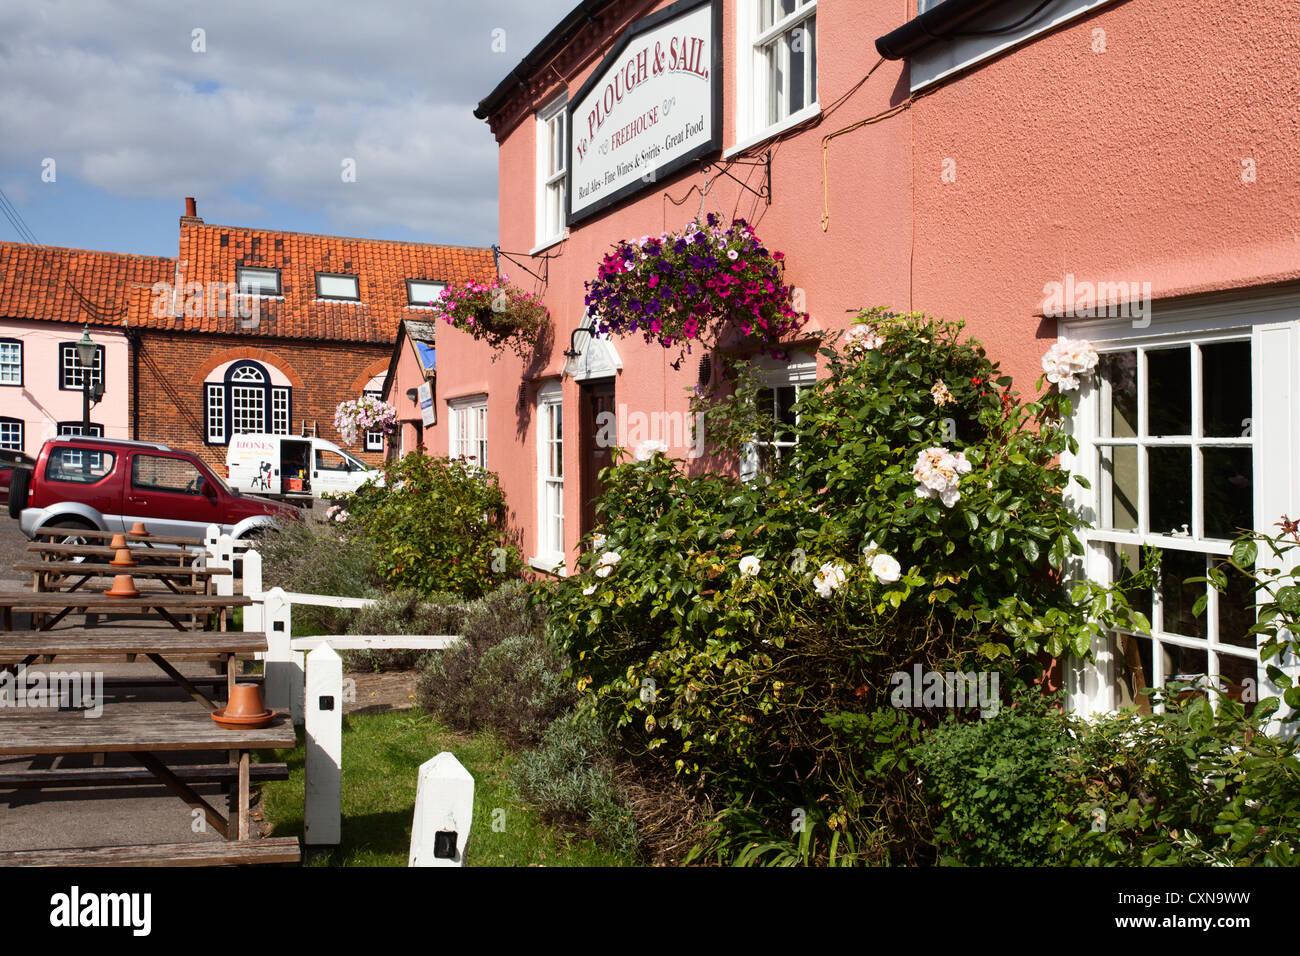 Plough and Sail Pub at Snape Maltings Suffolk England - Stock Image